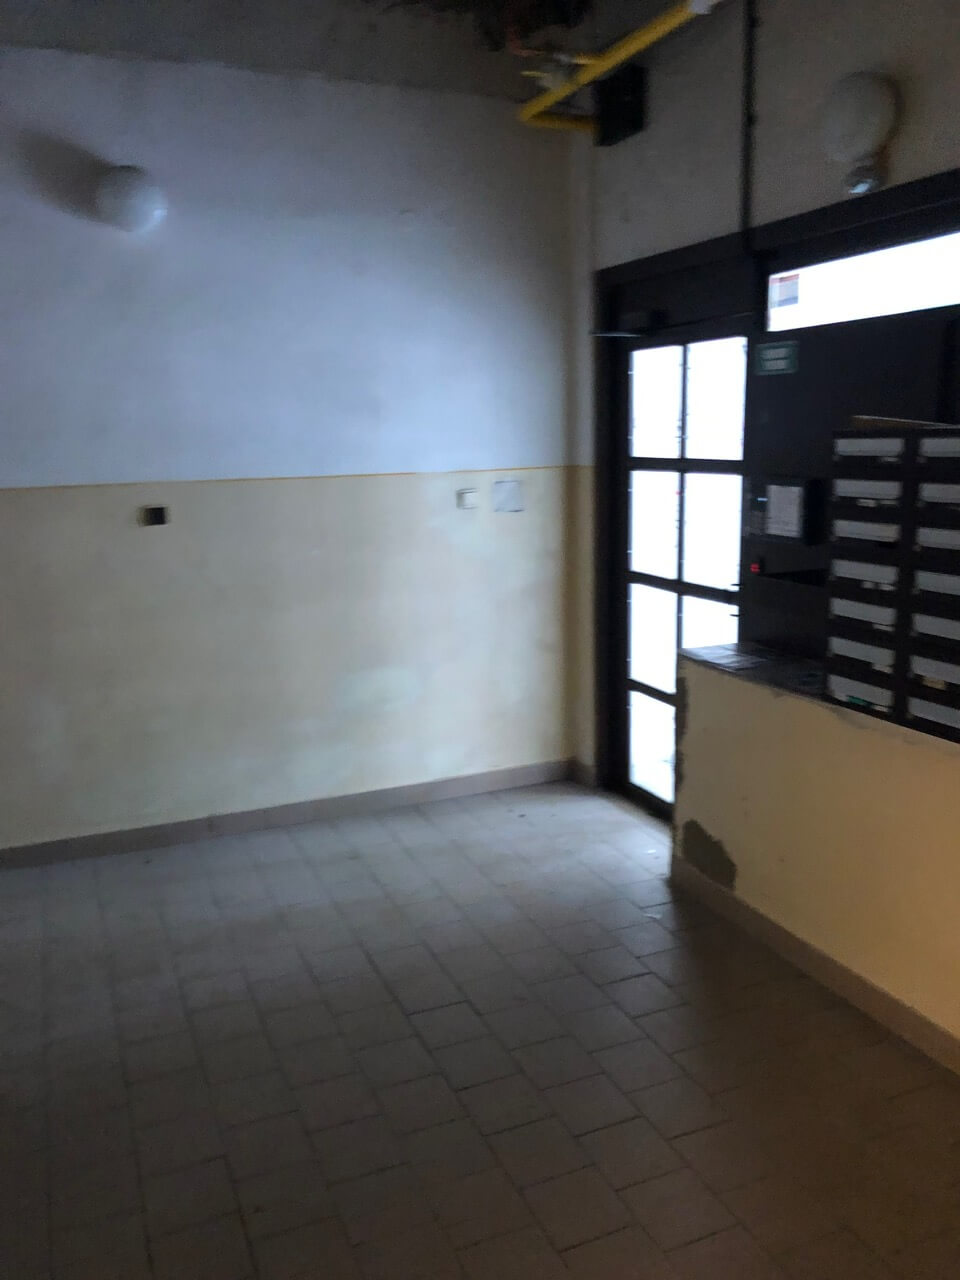 3 izbový byt, Račianska 85, 63m2, balkon 10m2, výborná lokalita-20